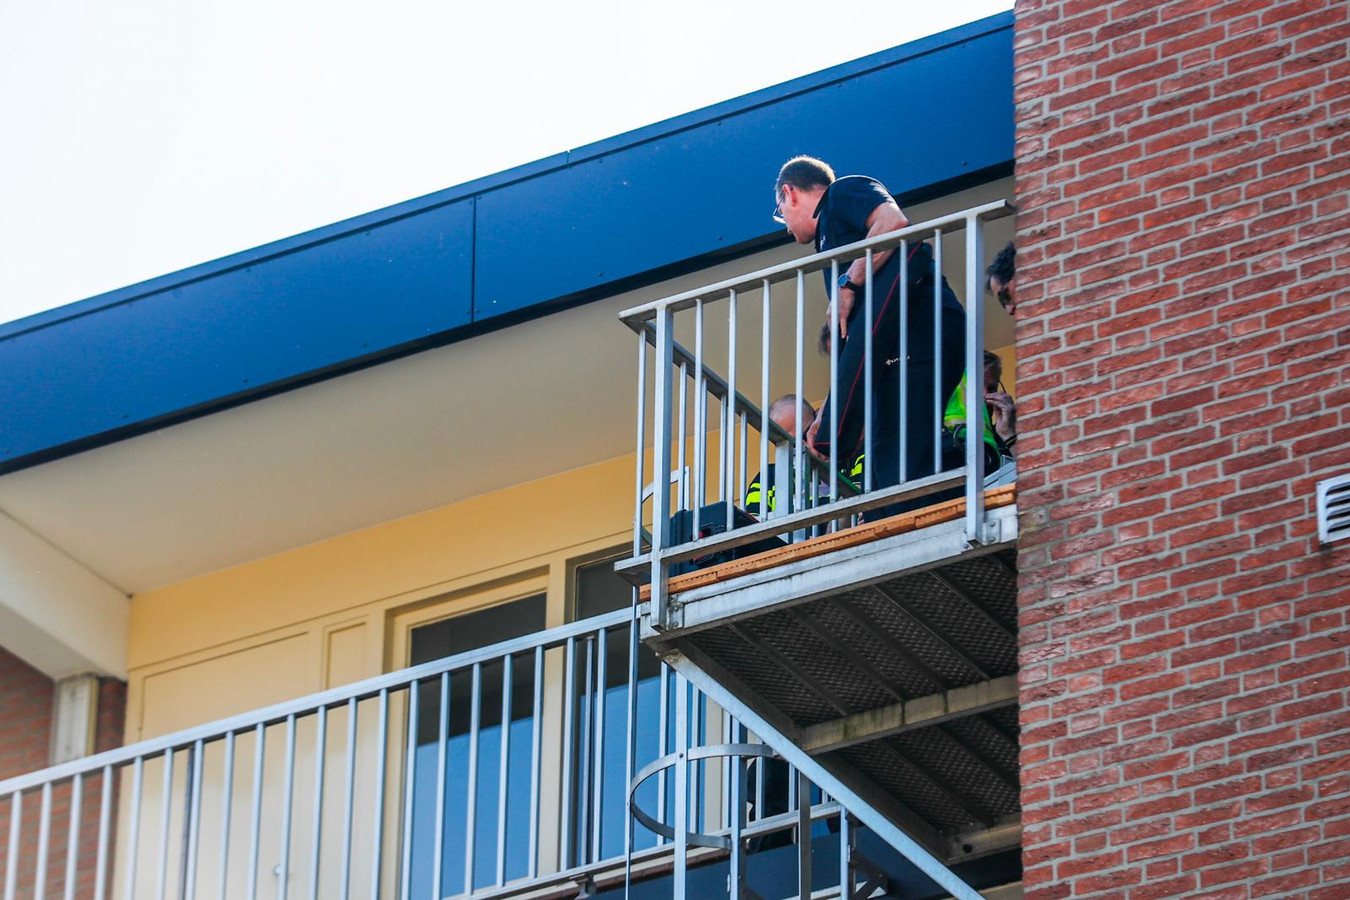 Dode vrouw gevonden in Eindhoven